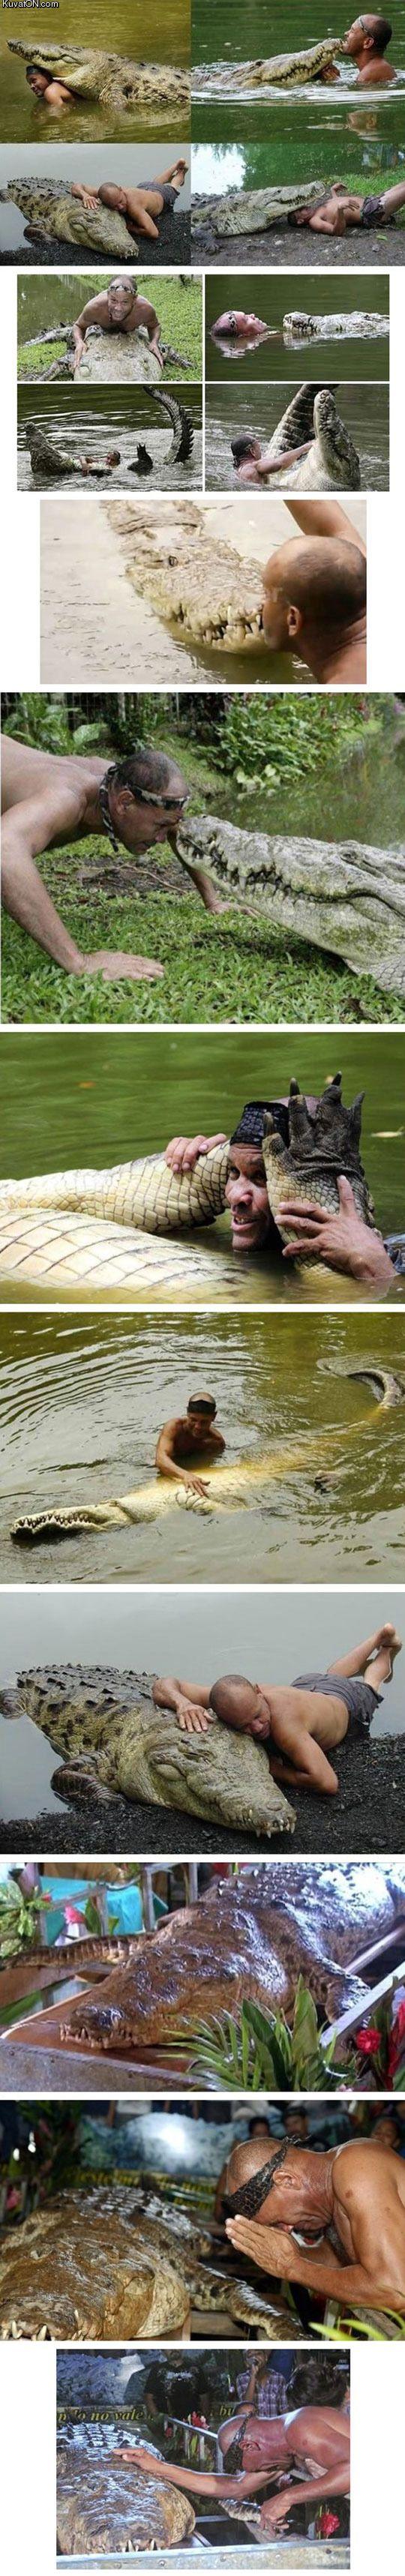 poncho_the_friendly_crocodile.jpg